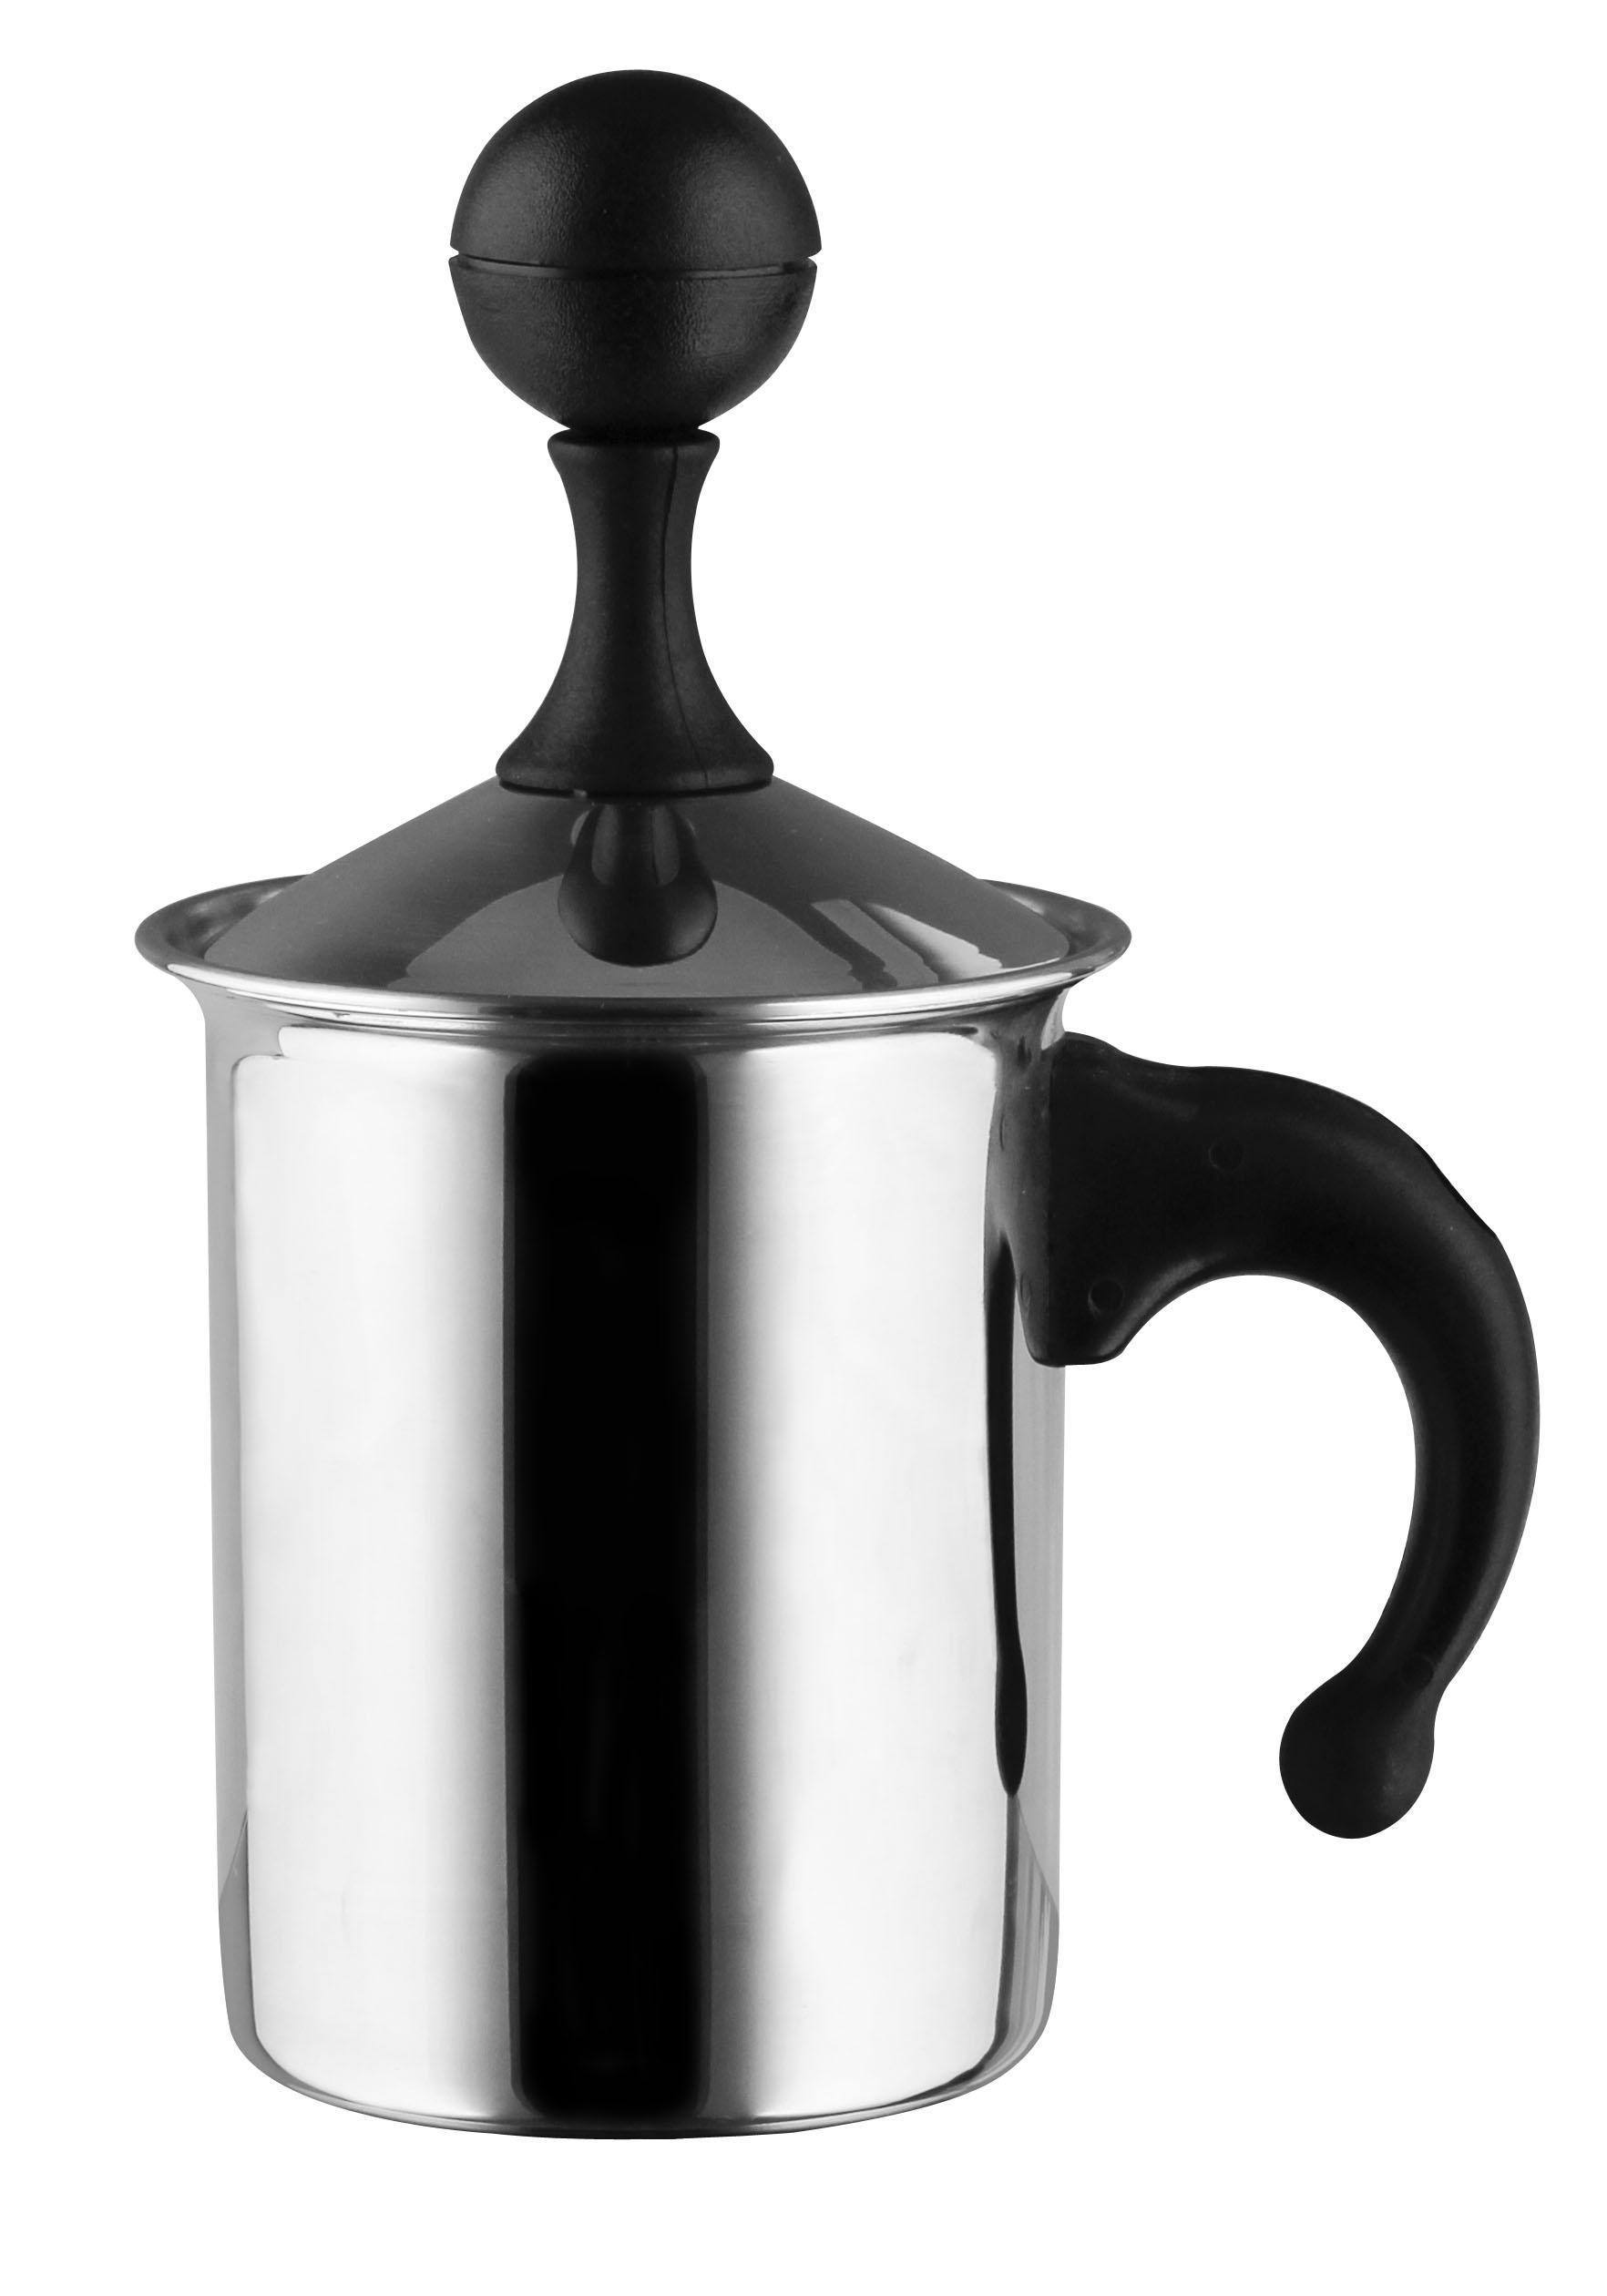 spieniacz-do-mleka-stalowy-frabosk-roma-0-1-l_1.jpg